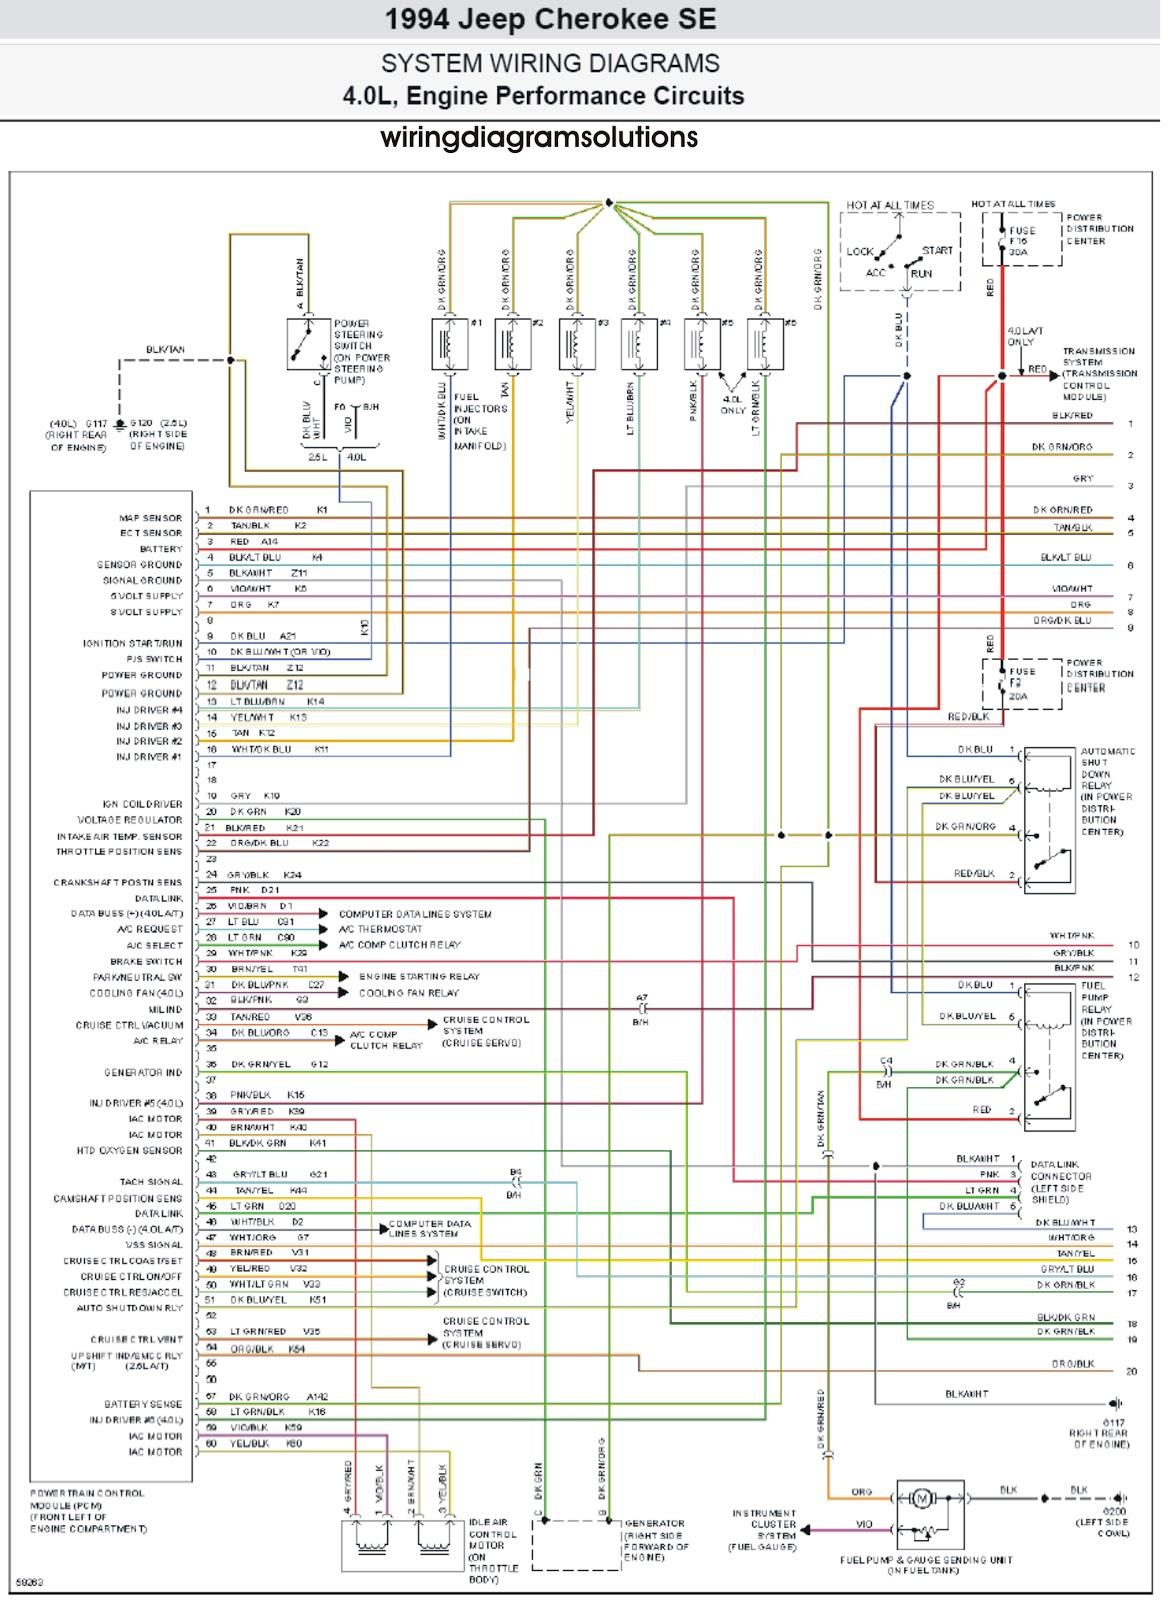 hight resolution of  2000 cherokee right rear wiring diagram schematic wiring diagram on dodge challenger wiring schematic